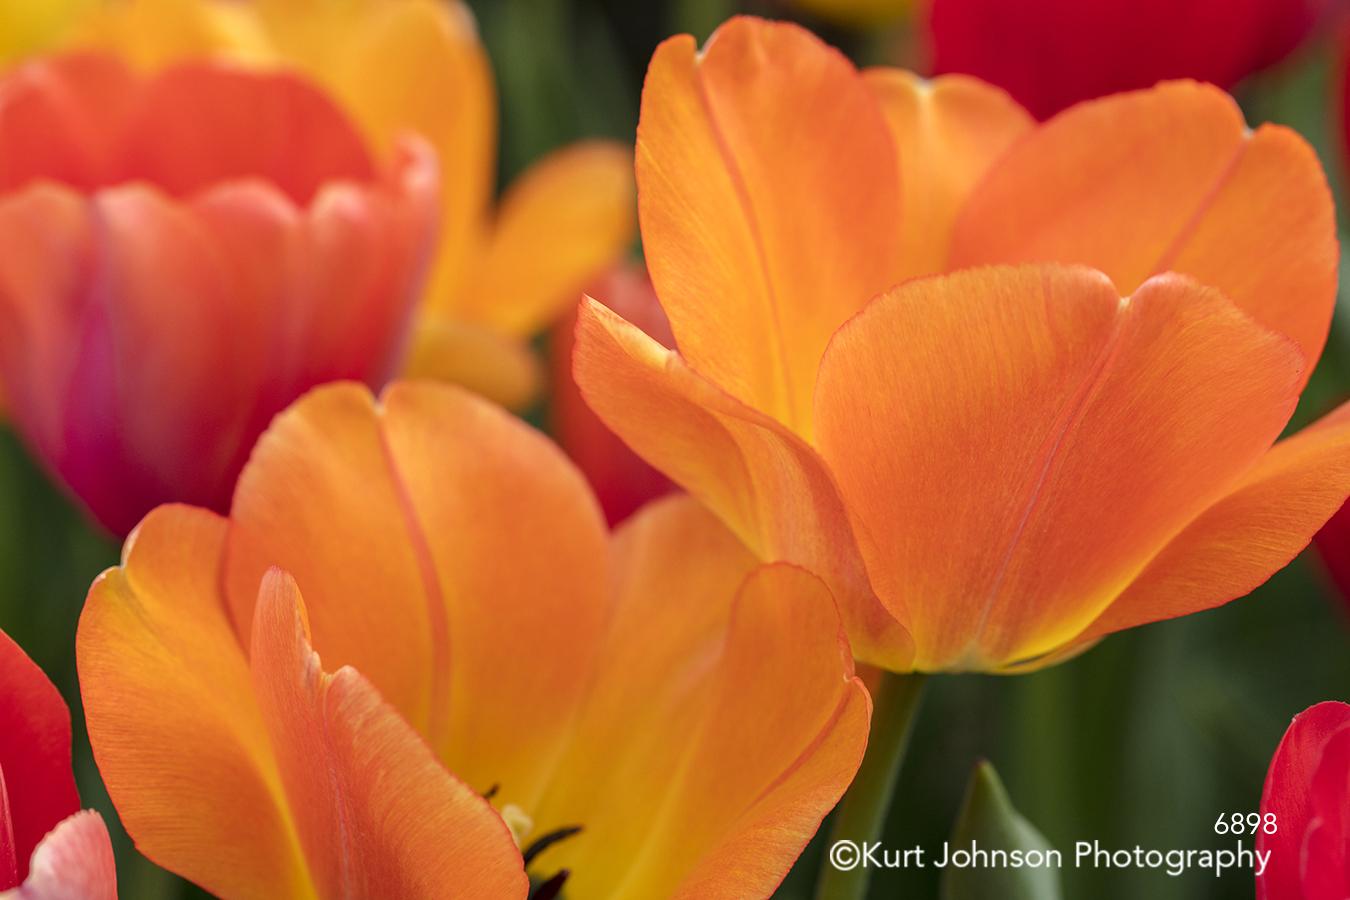 orange bright happy colorful spring tulips flower flowers